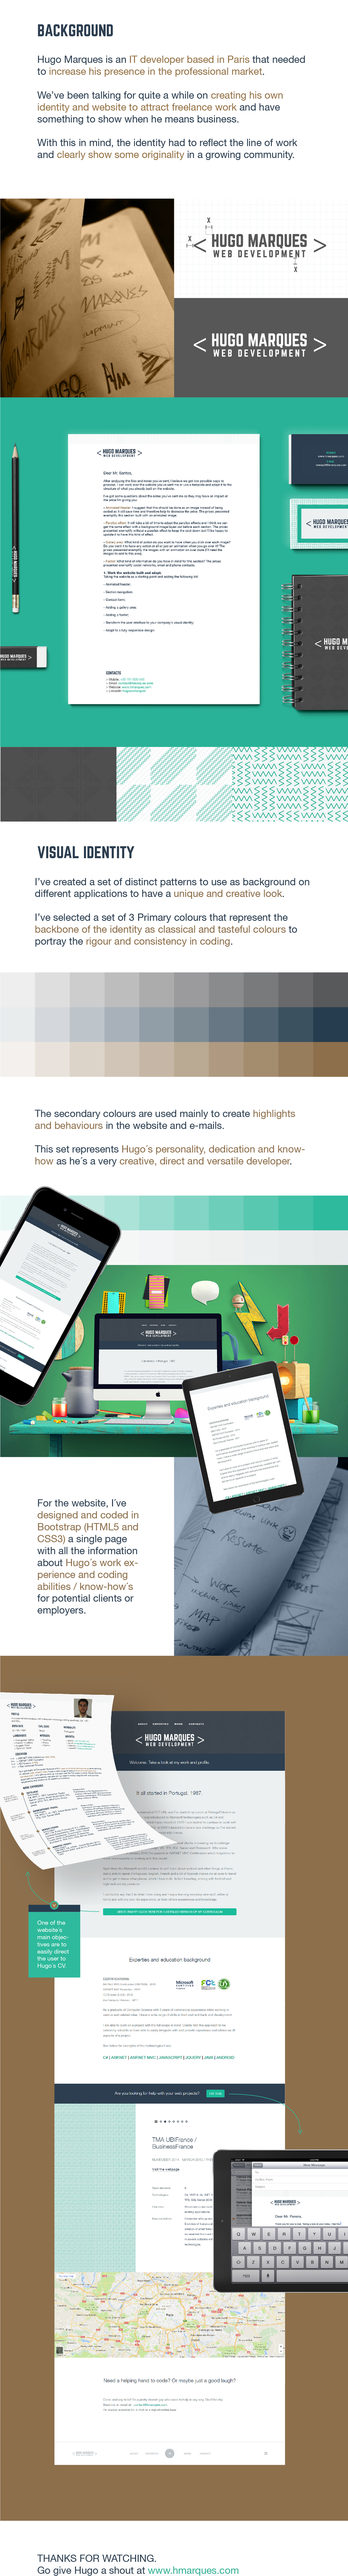 branding ,logo,Logotype,Webdevelopment,Webdesign,Website,stationary,CV,personal card,code